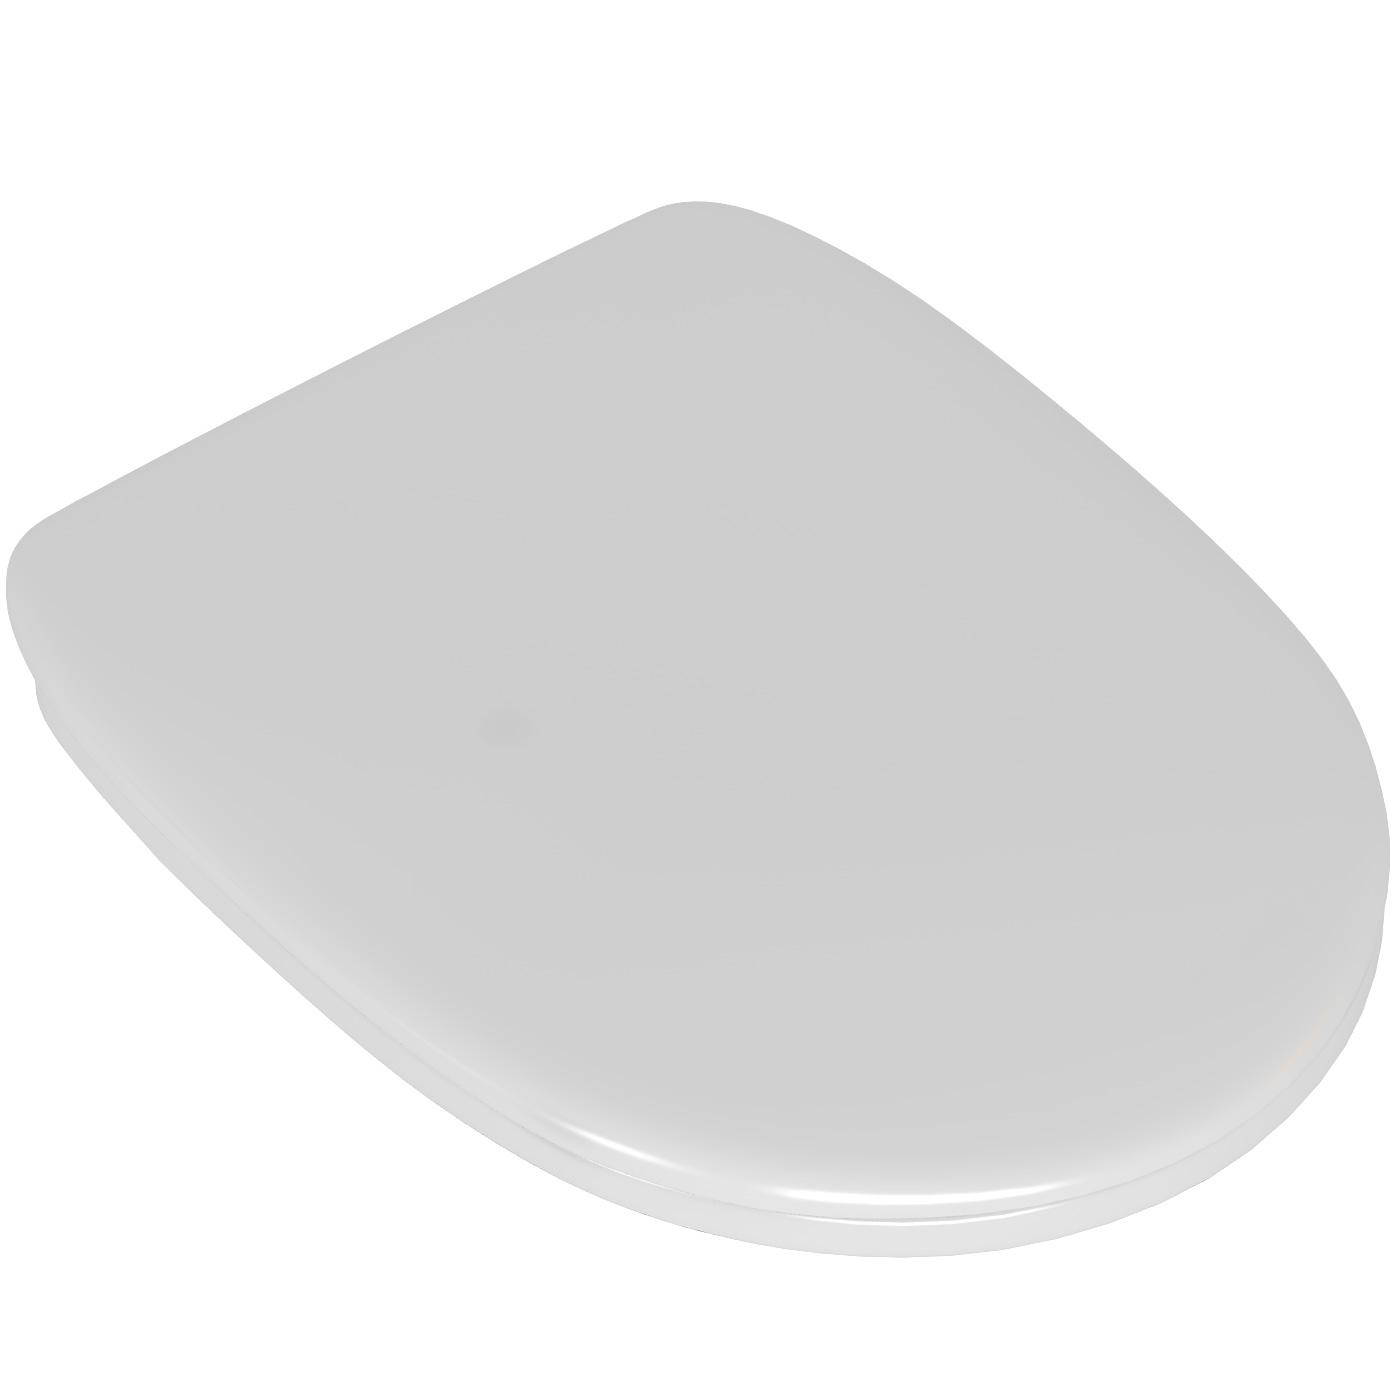 toilettendeckel klodeckel toilettensitz klobrille wc sitz absenkautomatik d04 4251012702048 ebay. Black Bedroom Furniture Sets. Home Design Ideas